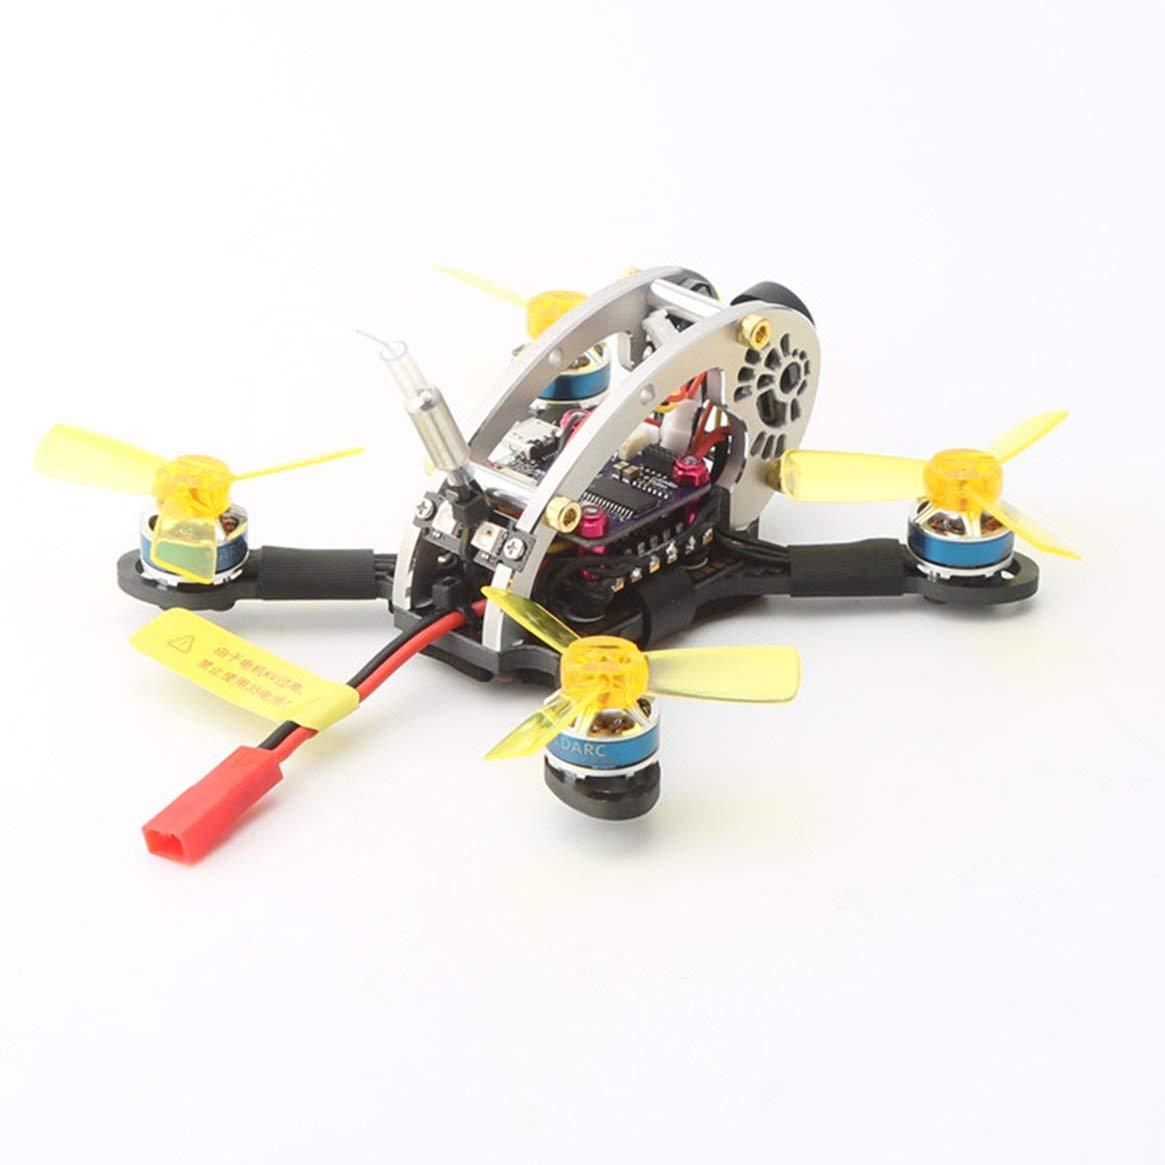 Delicacydex LDARC Flyegg 130 V2 5.8G Micro Mini Brushless FPV RC Racing Drohne Quadcopter mit RX2A PRO Empfänger VTX Kamera OSD PNP-Version - Schwarz & Gelb